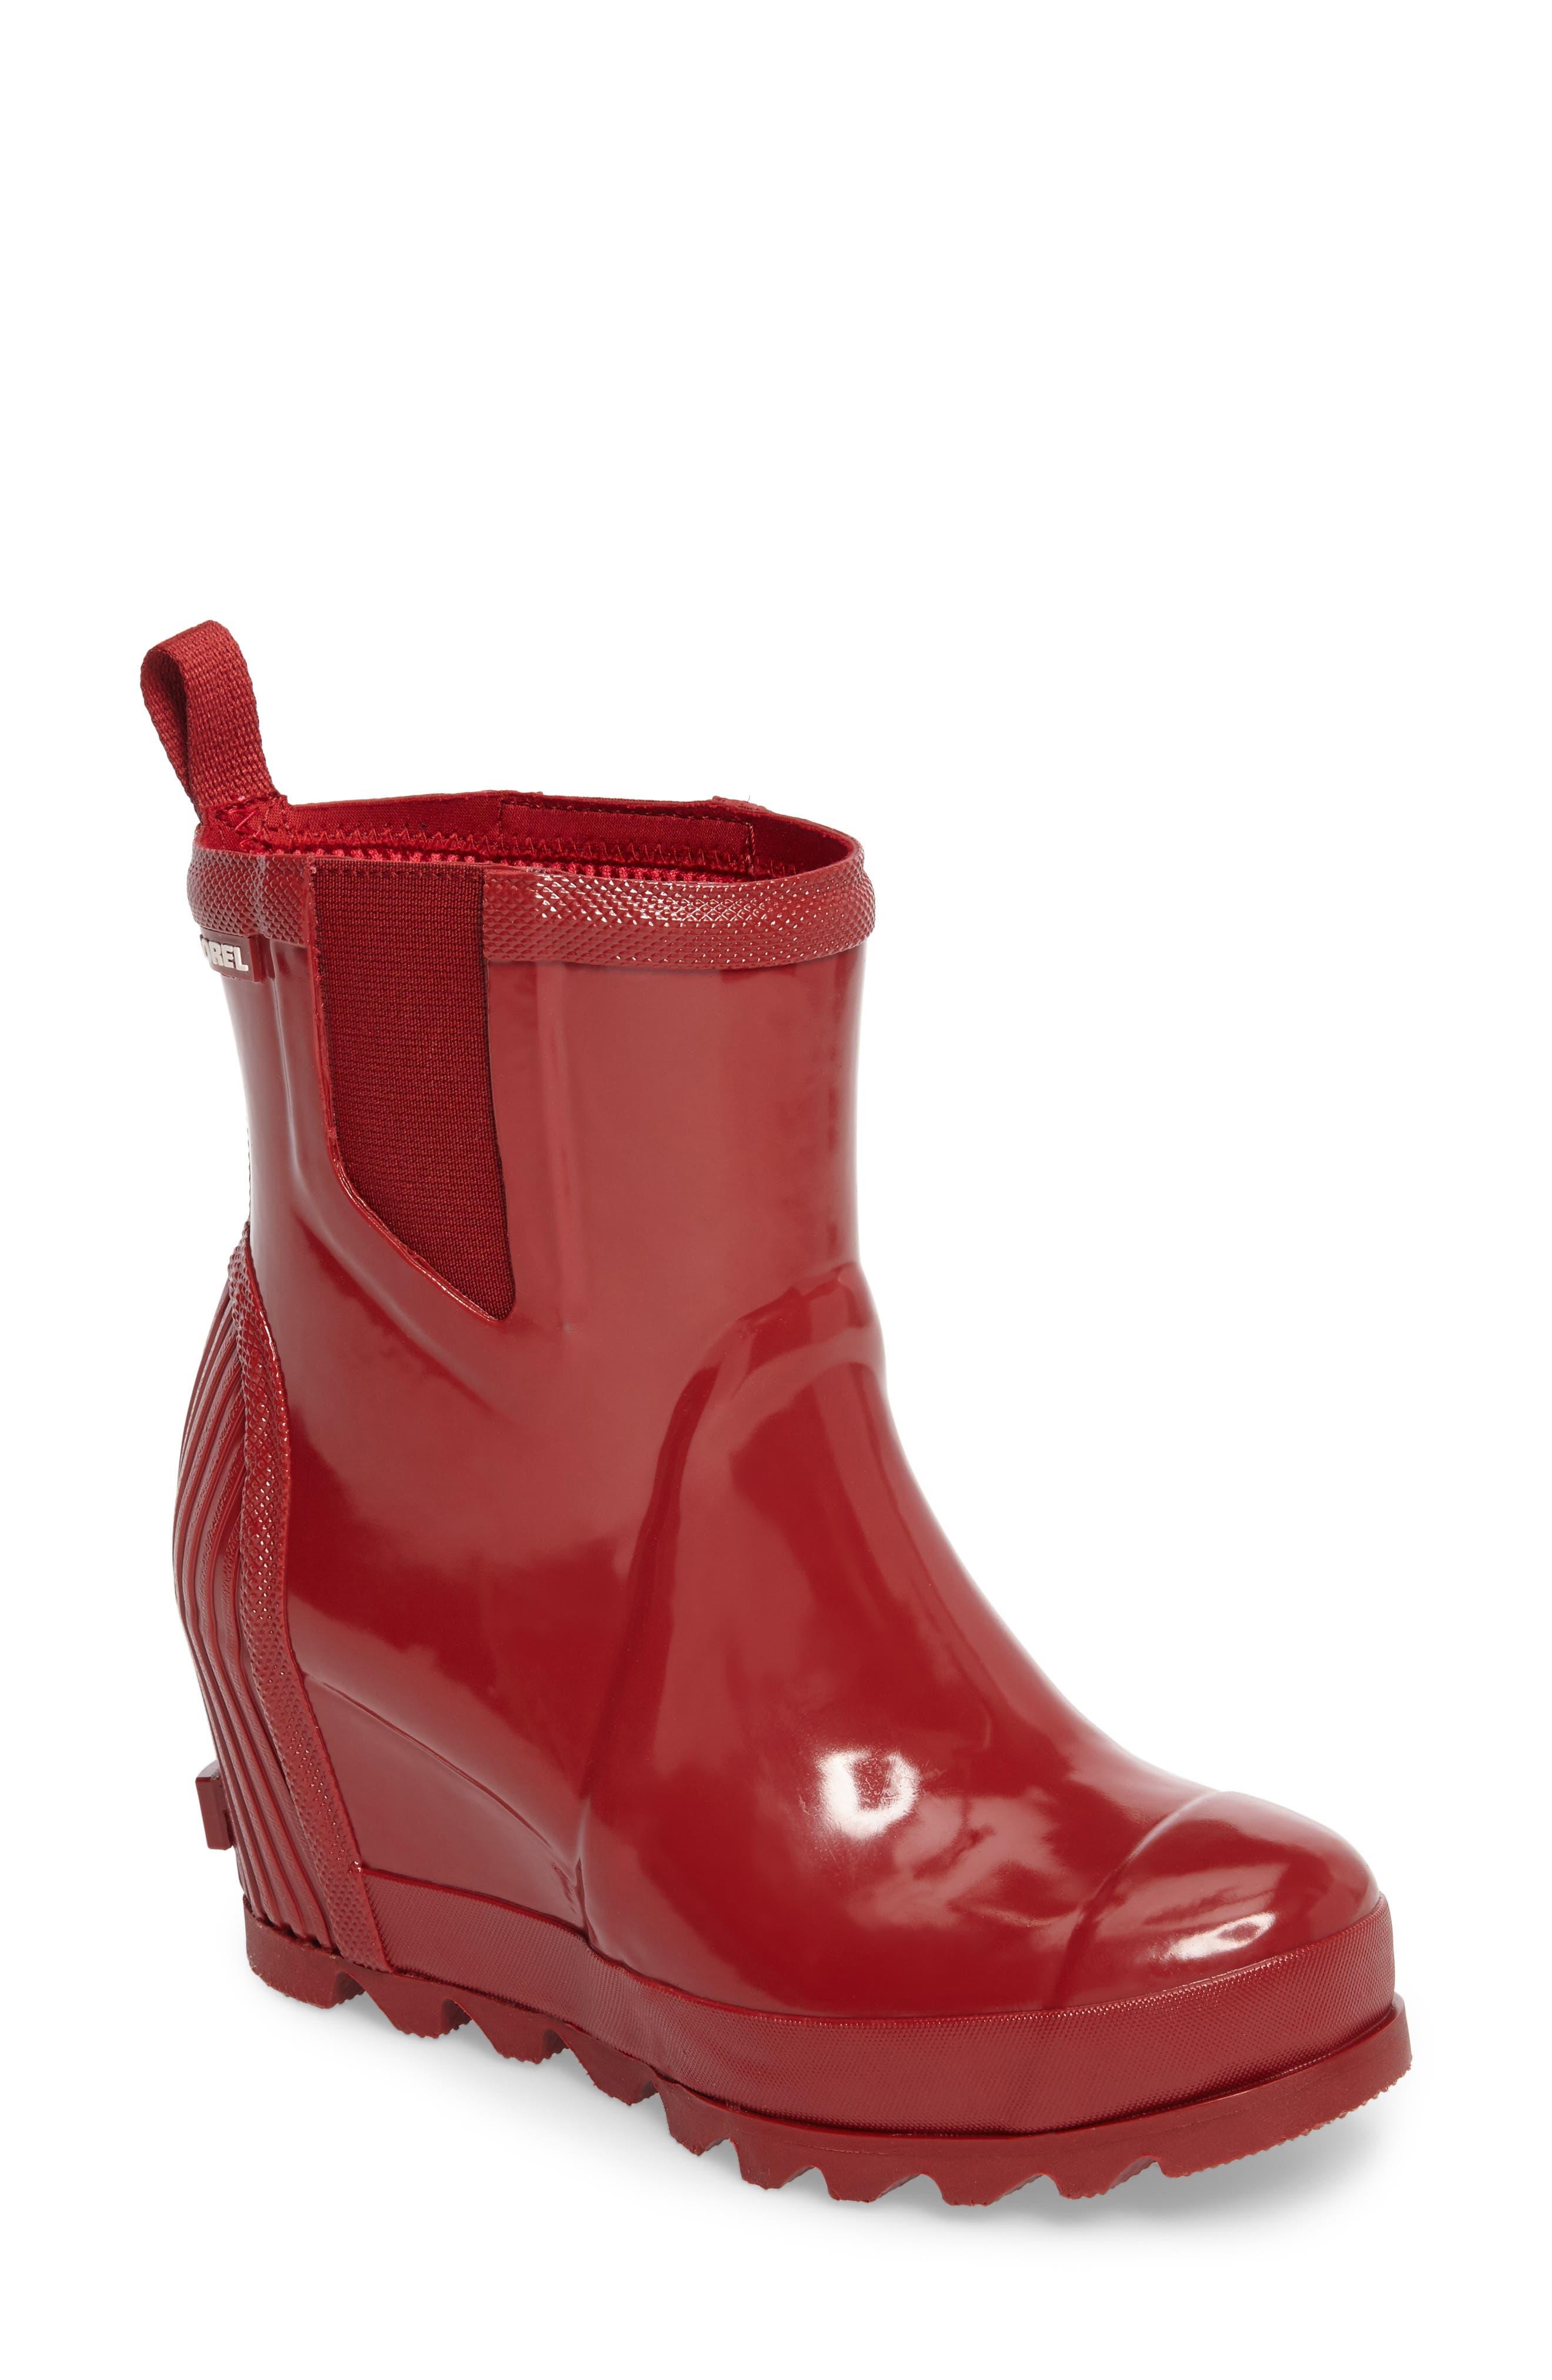 Joan Glossy Wedge Rain Boot,                         Main,                         color, Red Dahlia/ Candy Apple